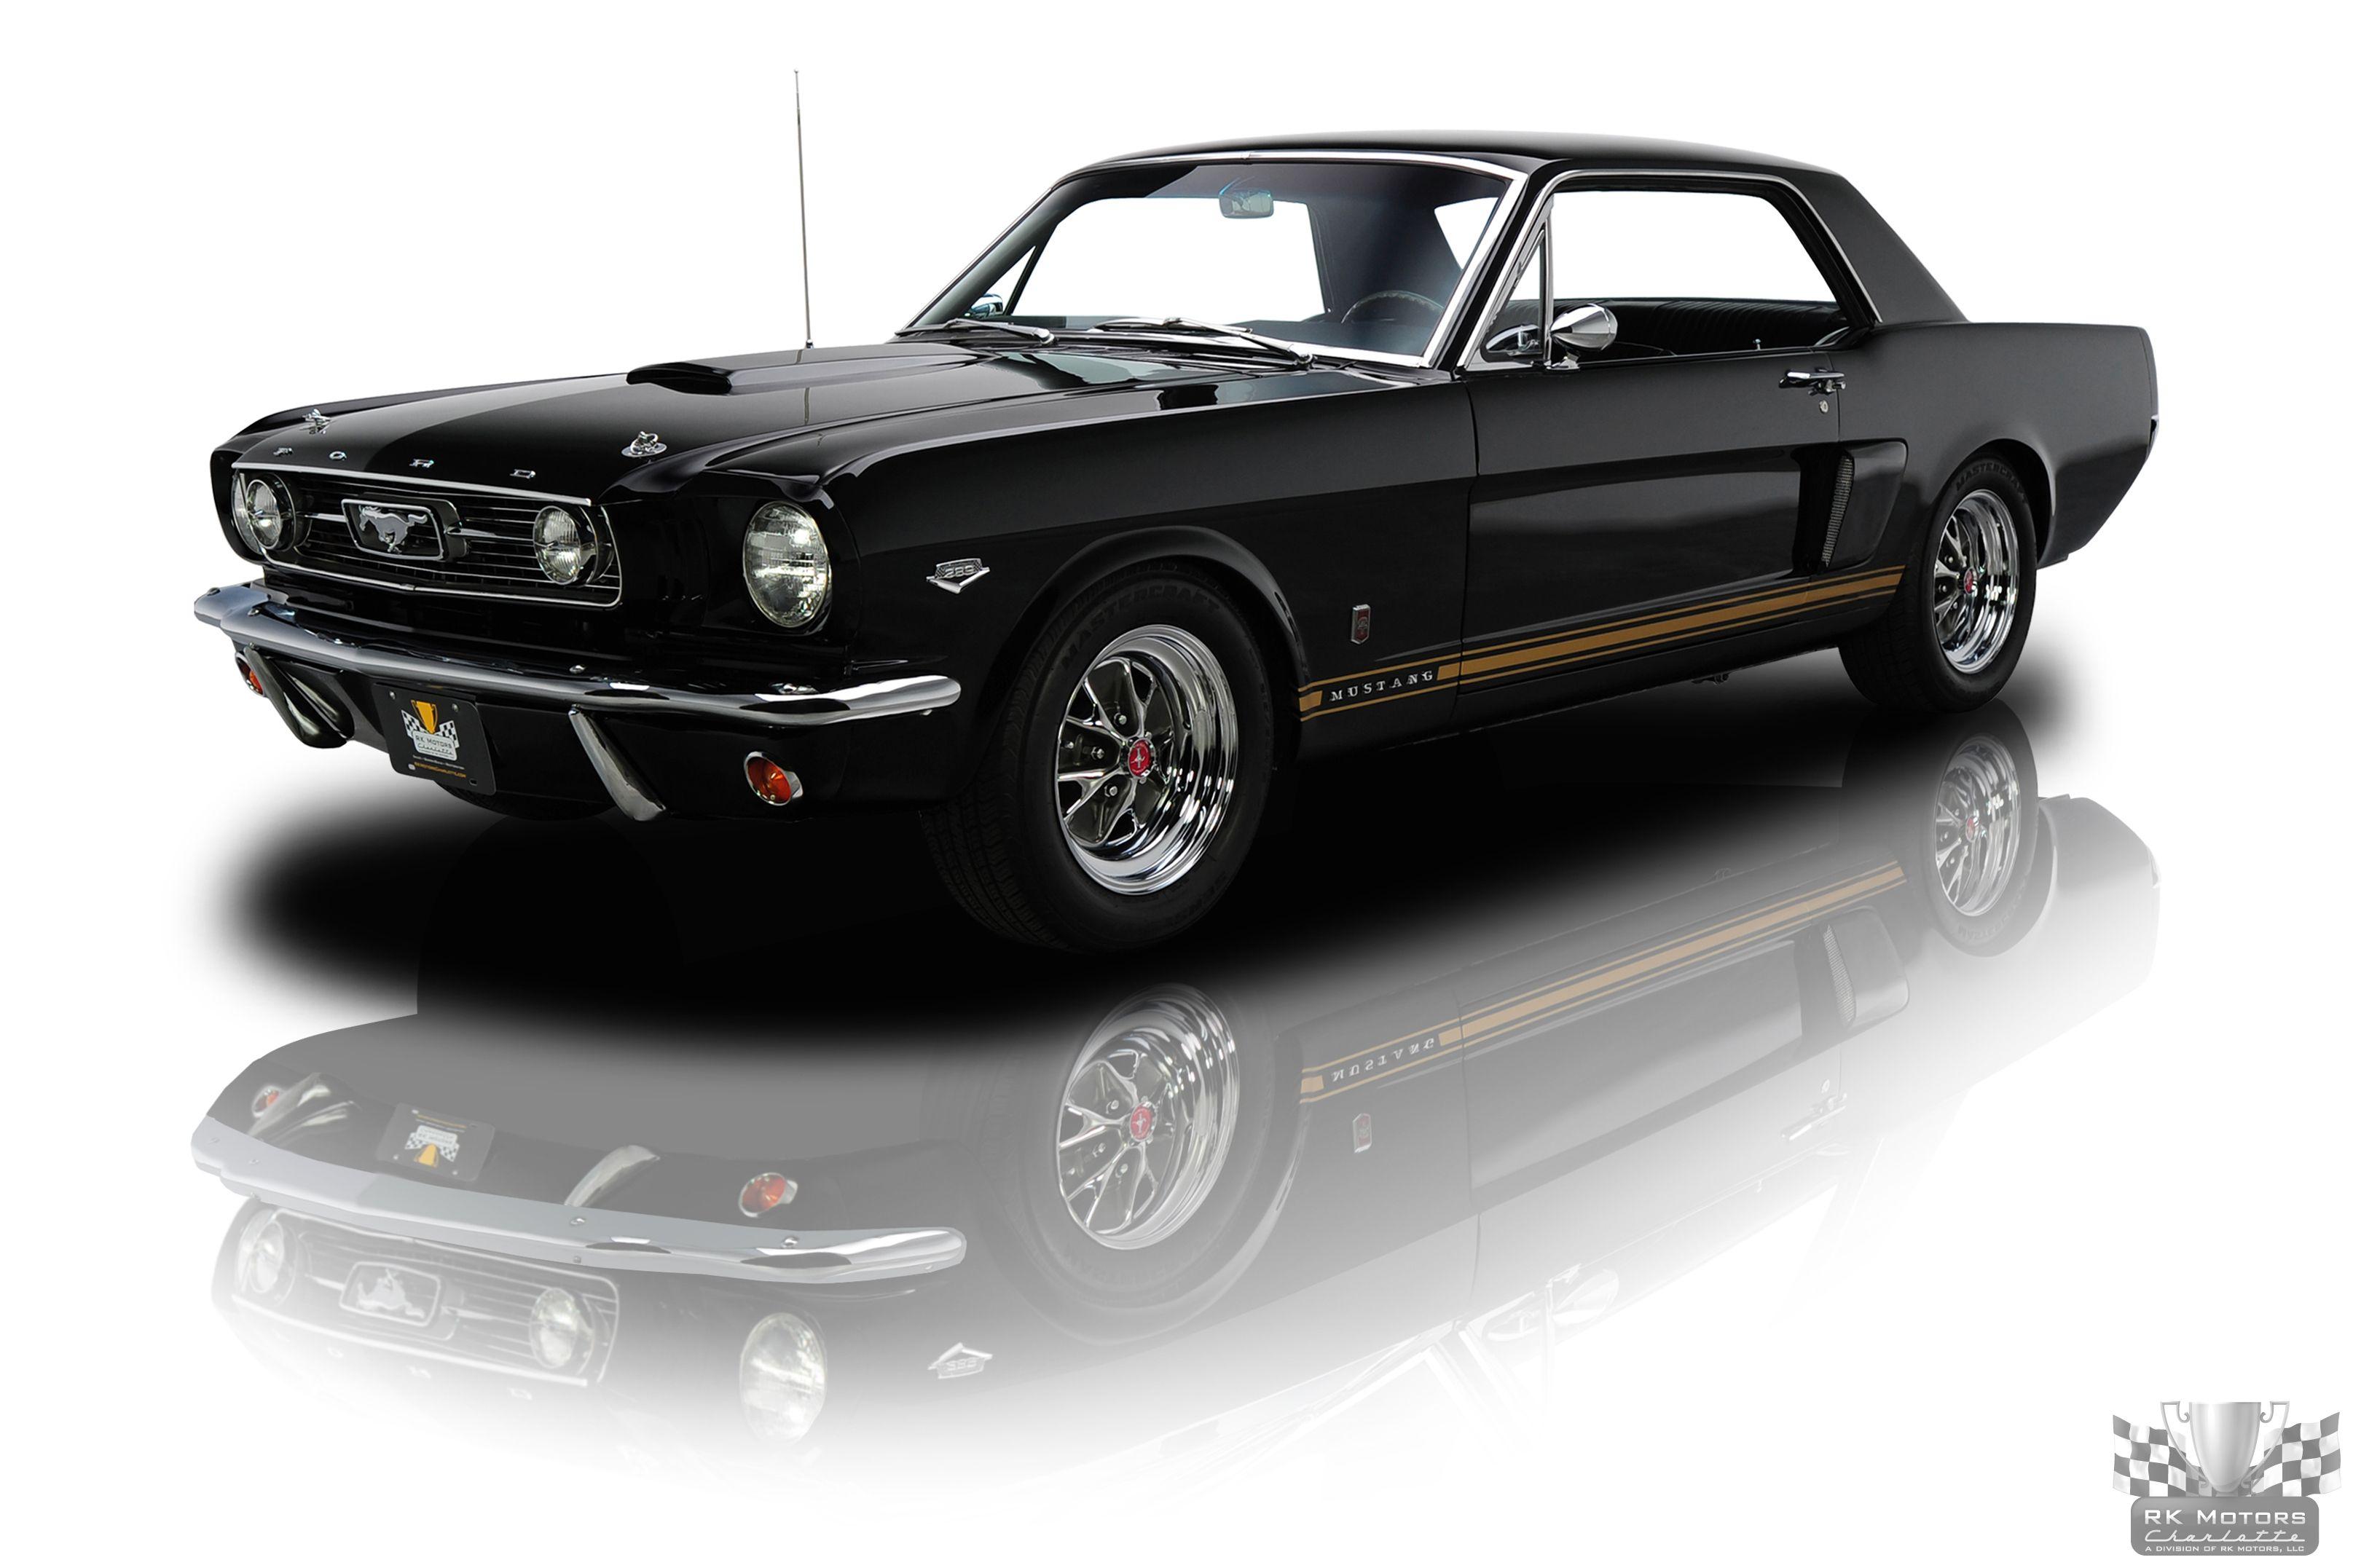 1966 Ford Mustang Gt 289 In 2020 Ford Mustang Ford Mustang Gt Mustang